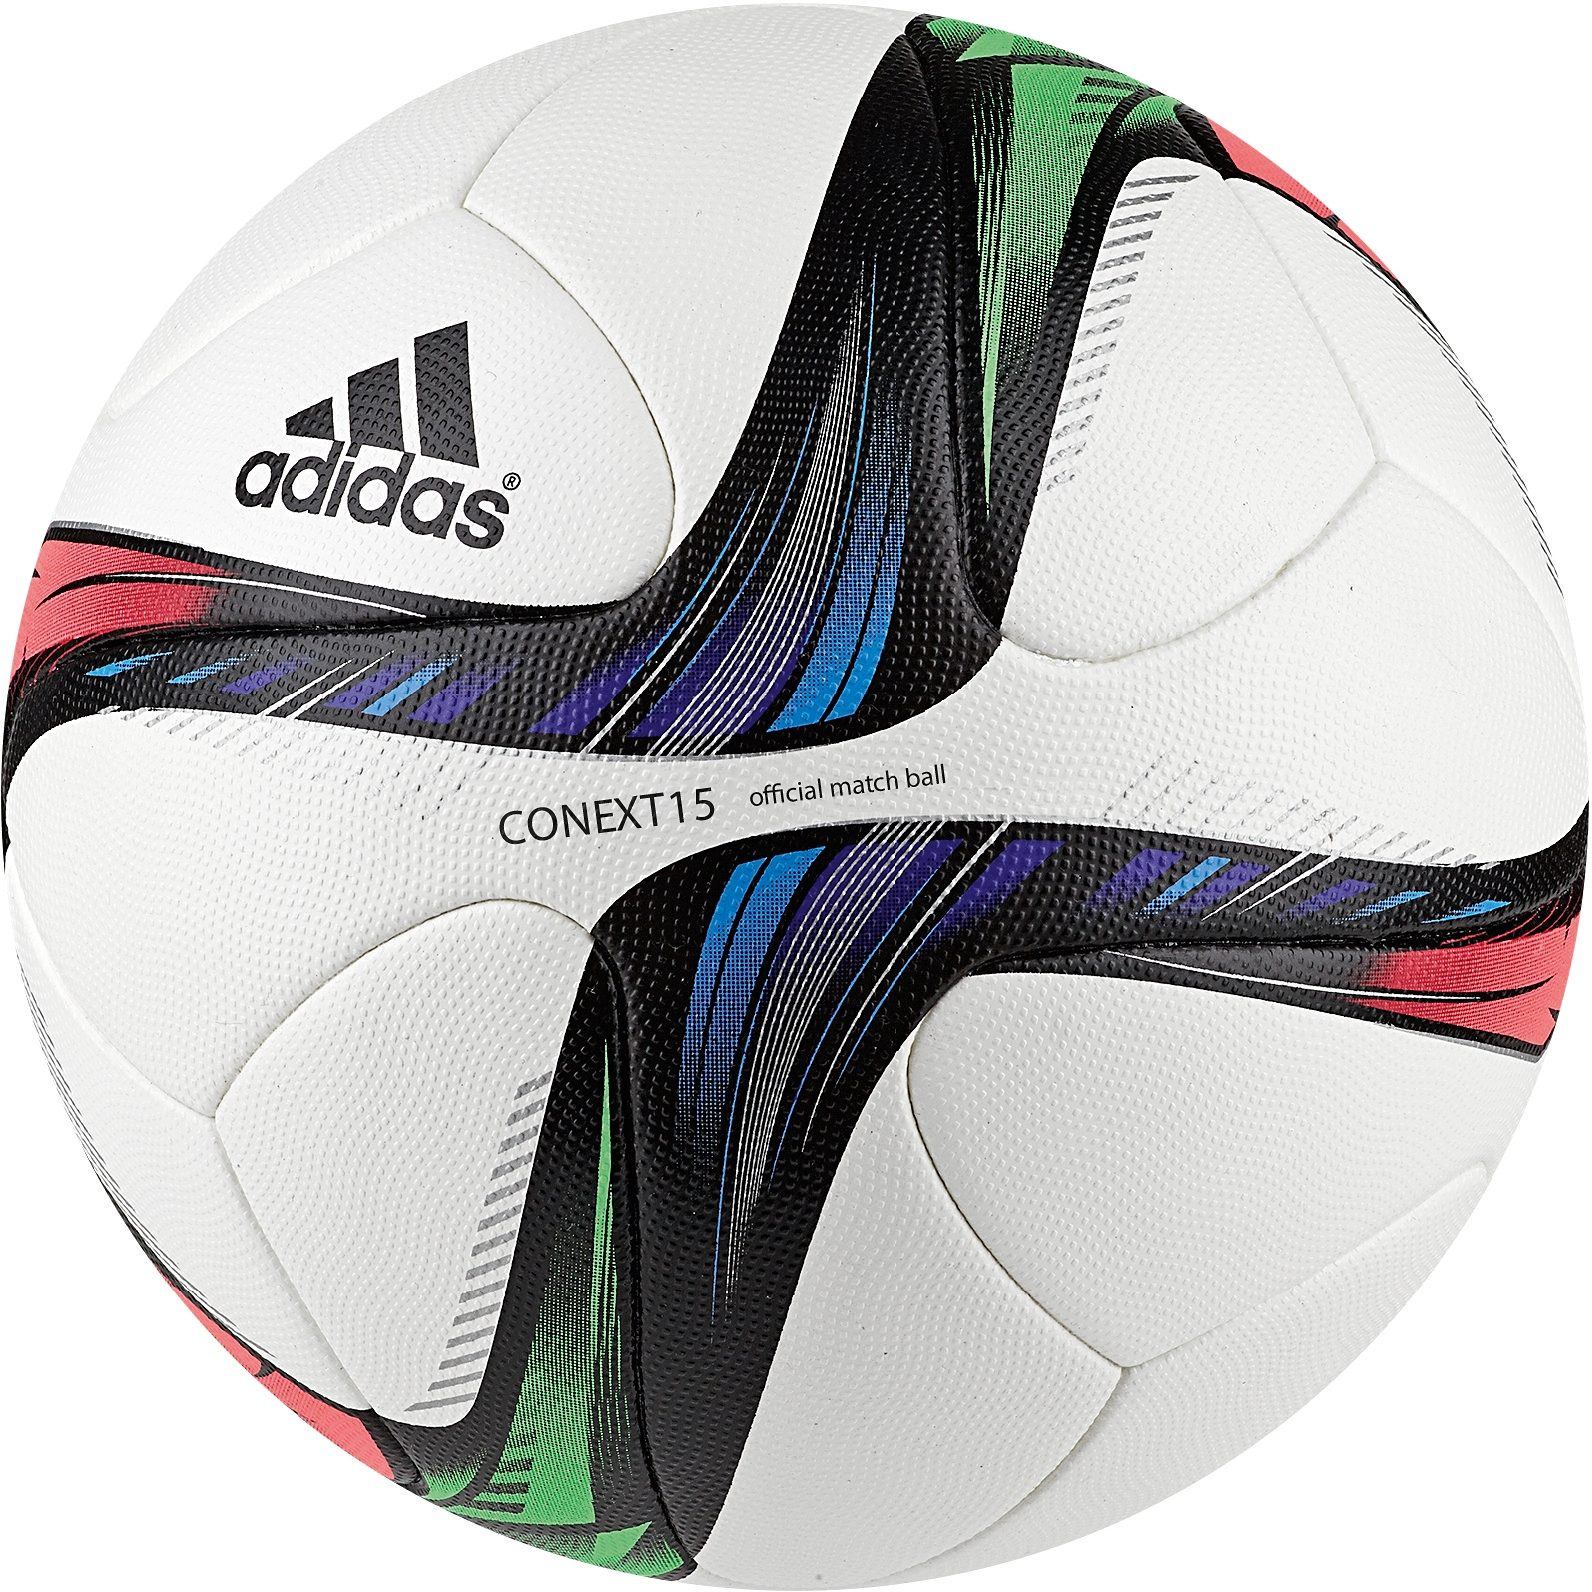 adidas Performance Conext 15 Matchball